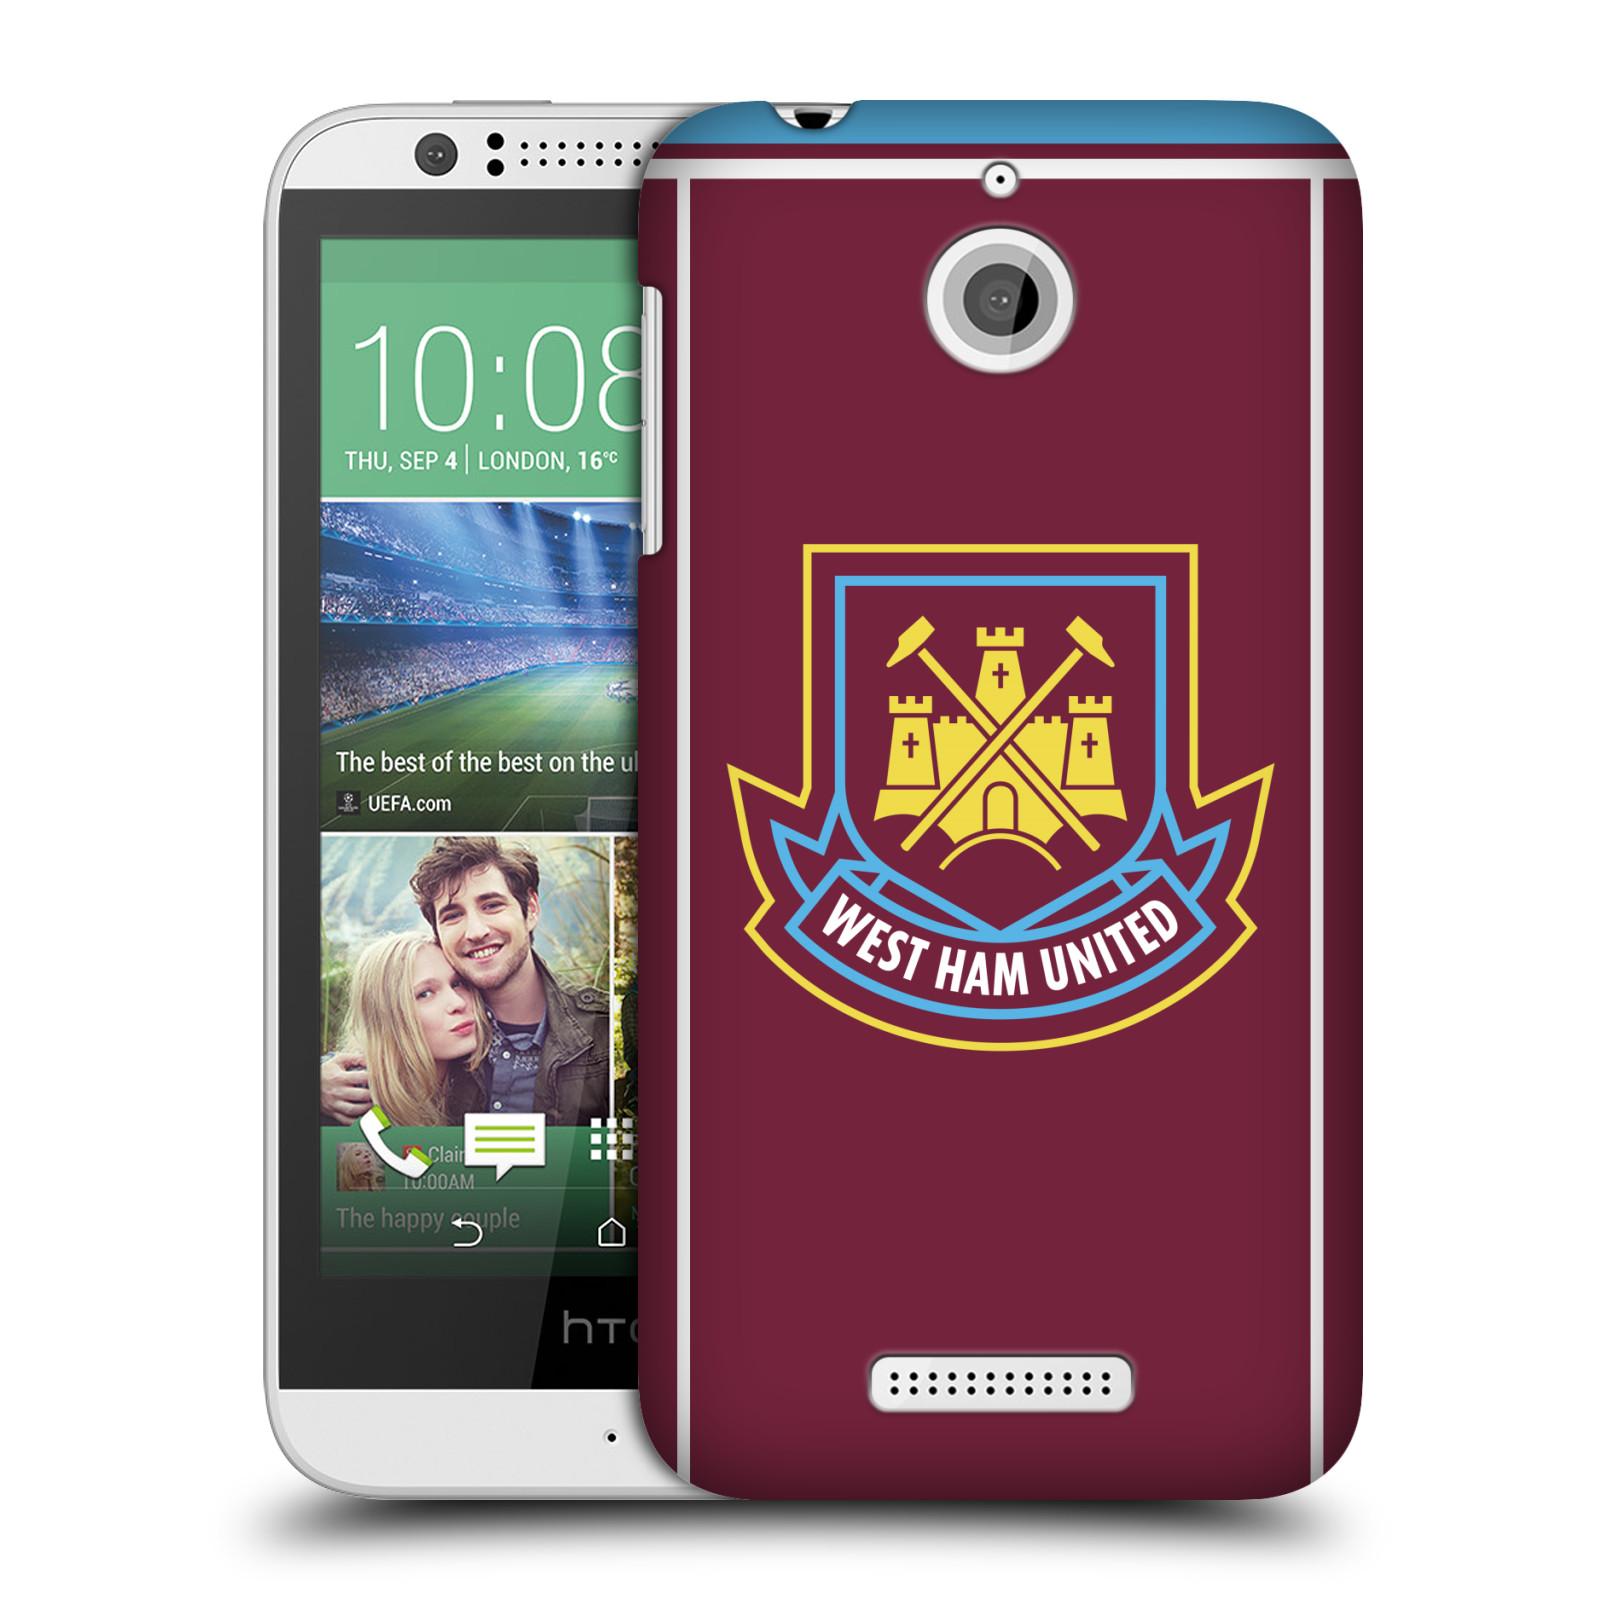 Plastové pouzdro na mobil HTC Desire 510 - Head Case - West Ham United - Retro znak